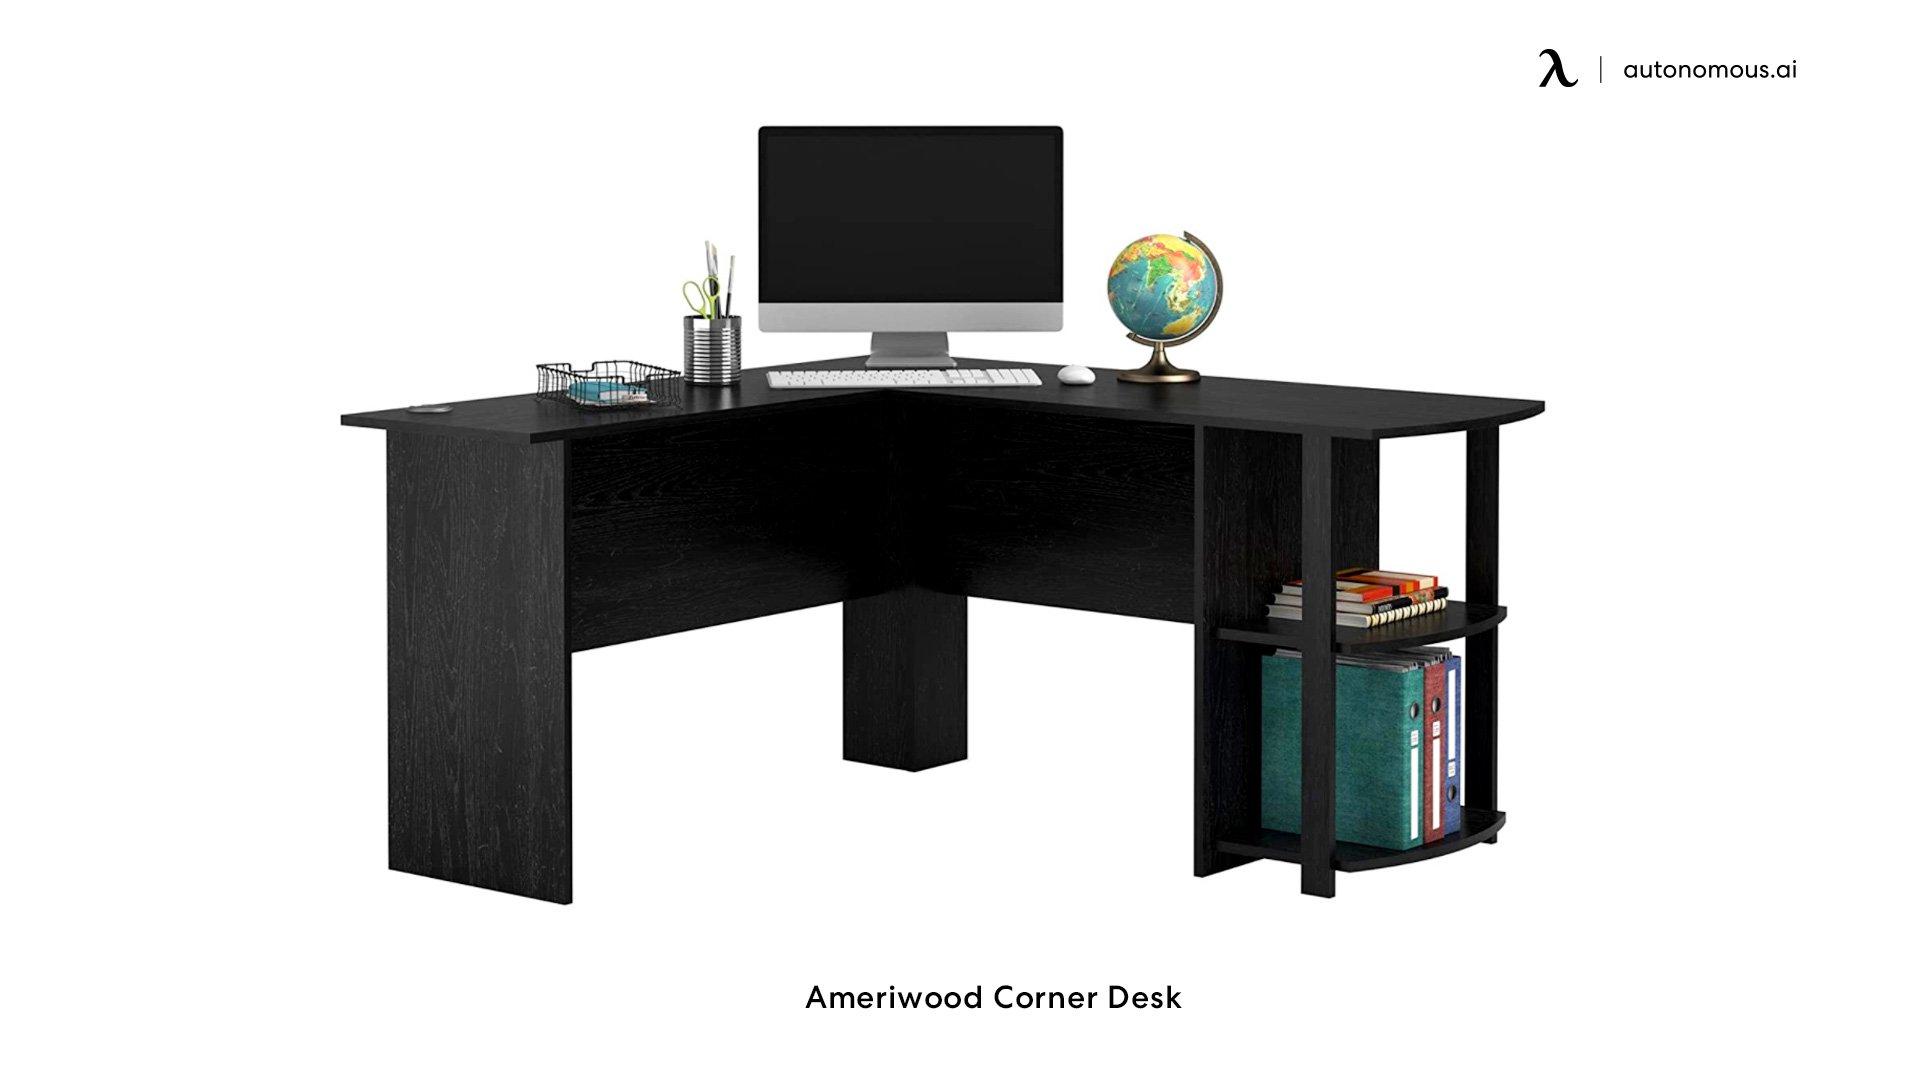 Ameriwood Corner standing desk